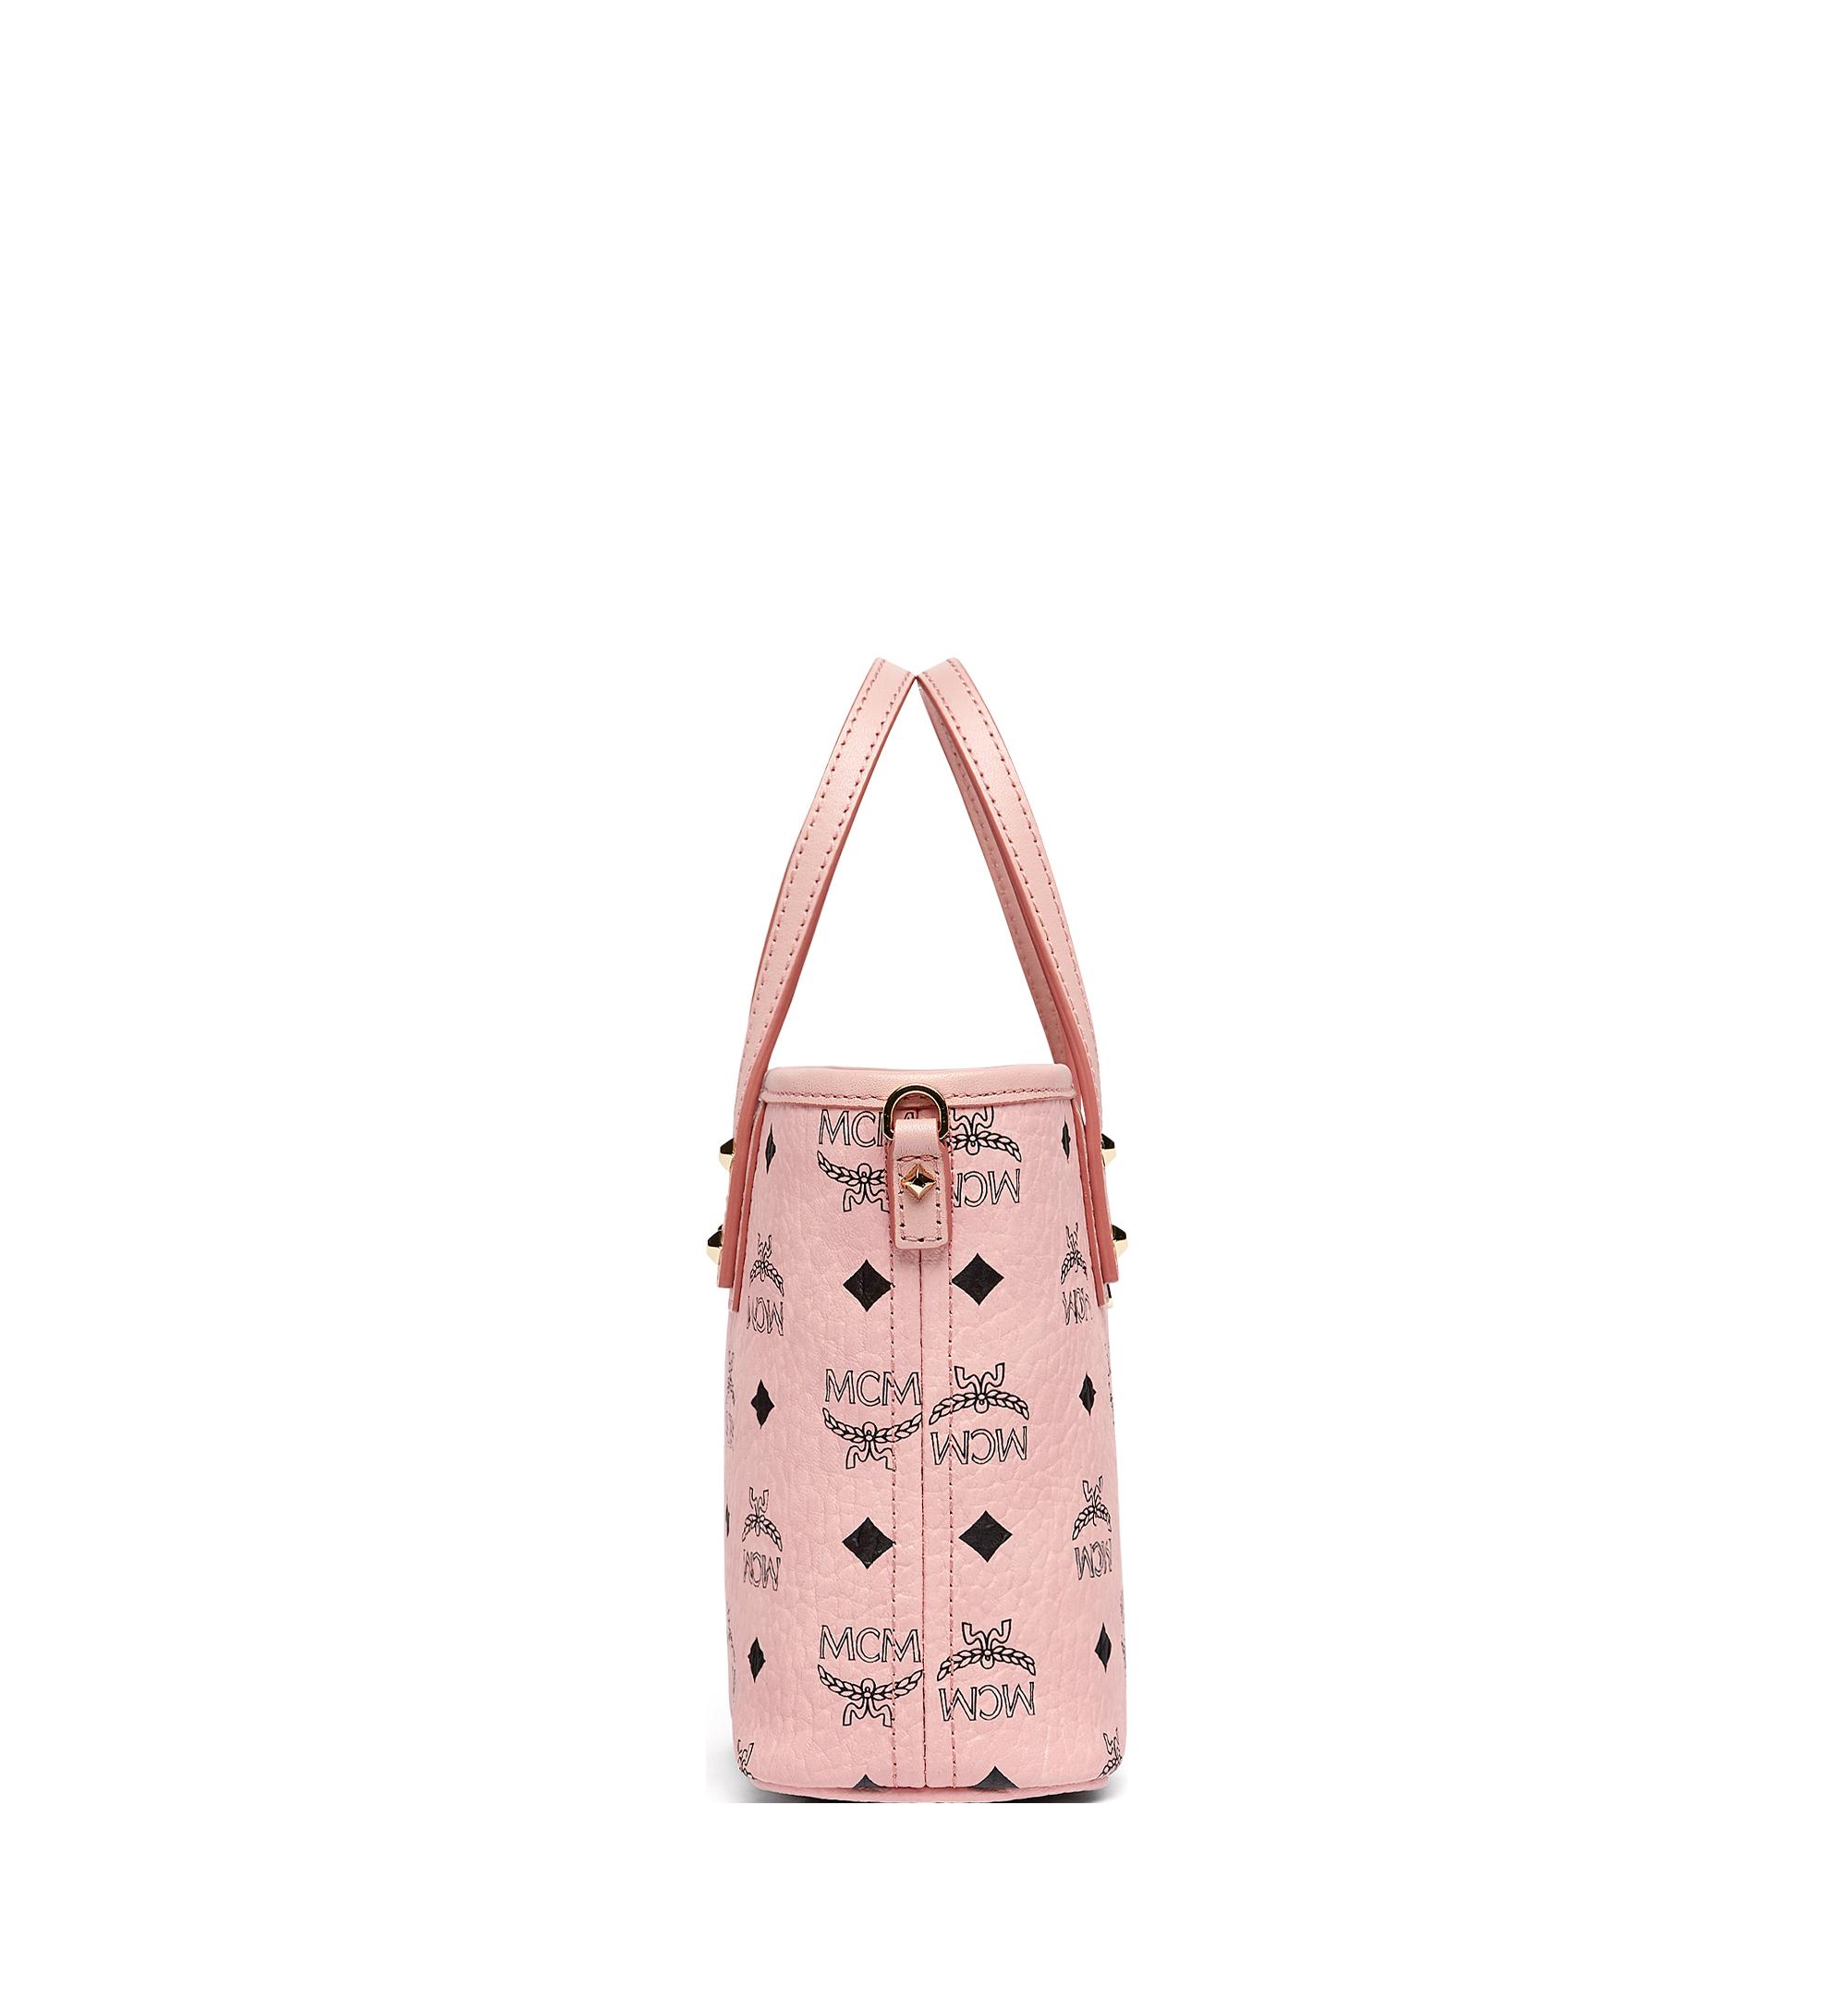 Mini Anya Shopper mit Reissverschluss in Visetos Rosa   MCM® DE